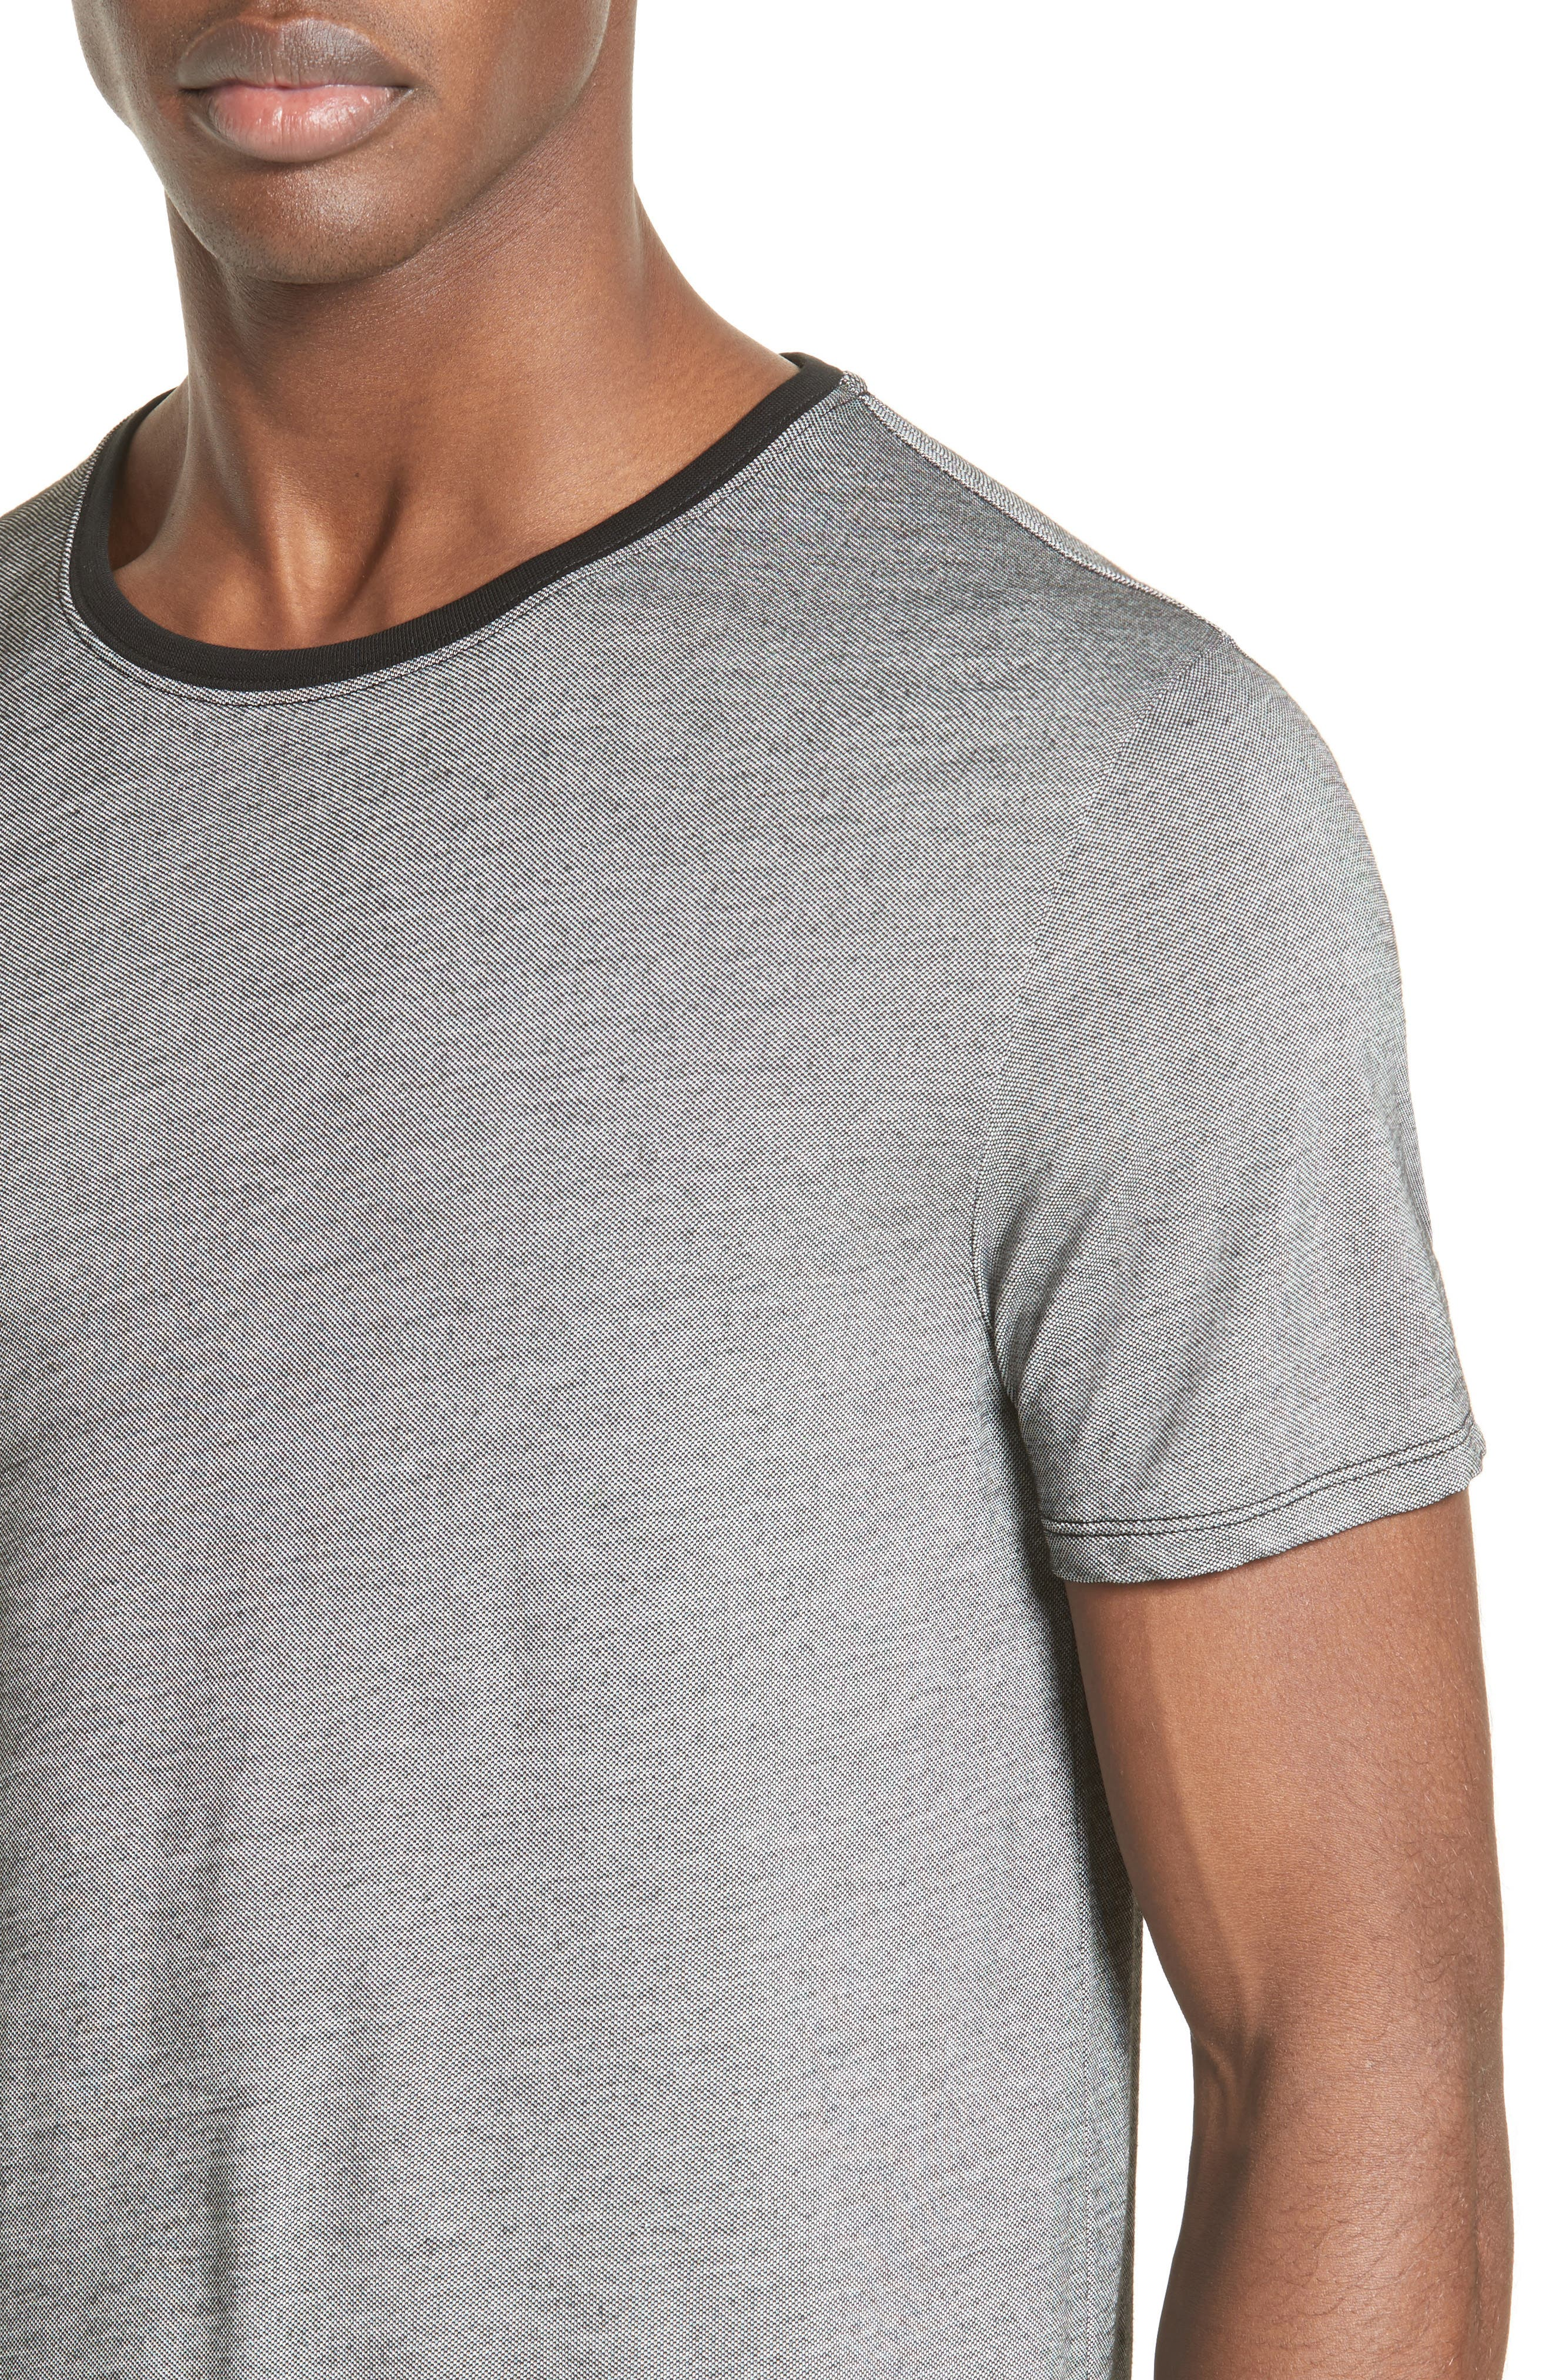 Contrast Crewneck T-Shirt,                             Alternate thumbnail 4, color,                             Grey